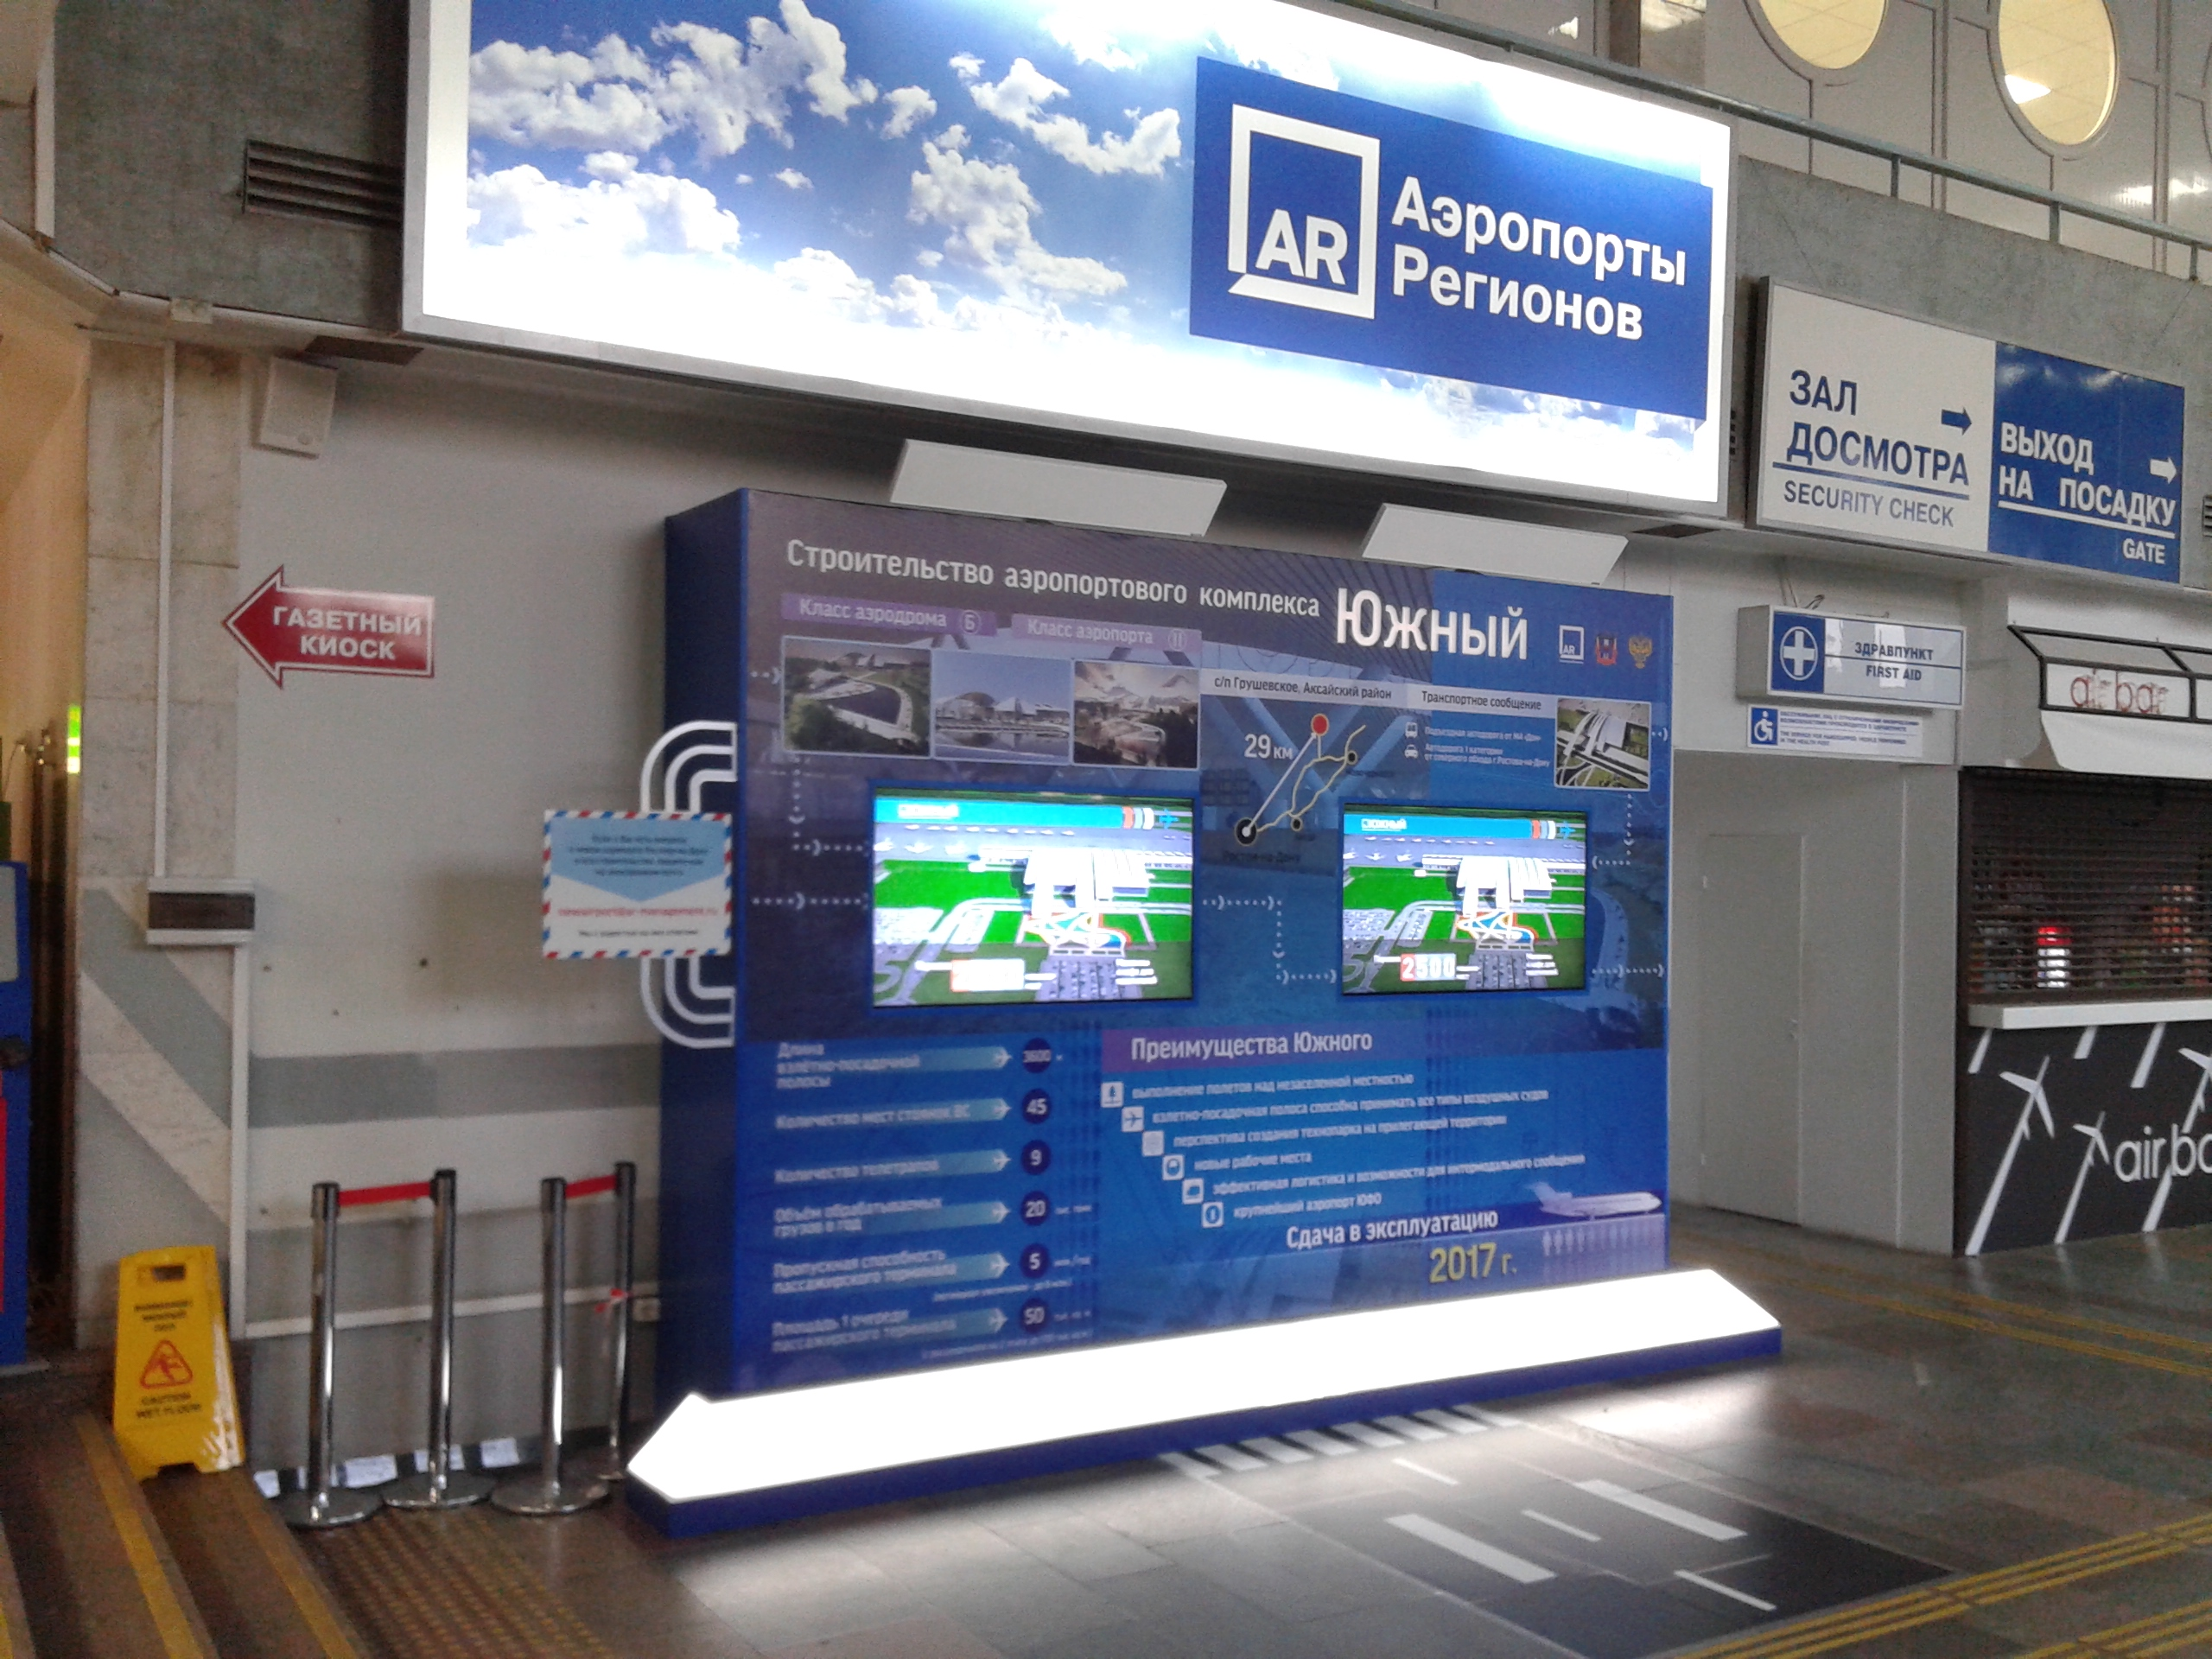 2015-06-30 Информационный стенд аэро